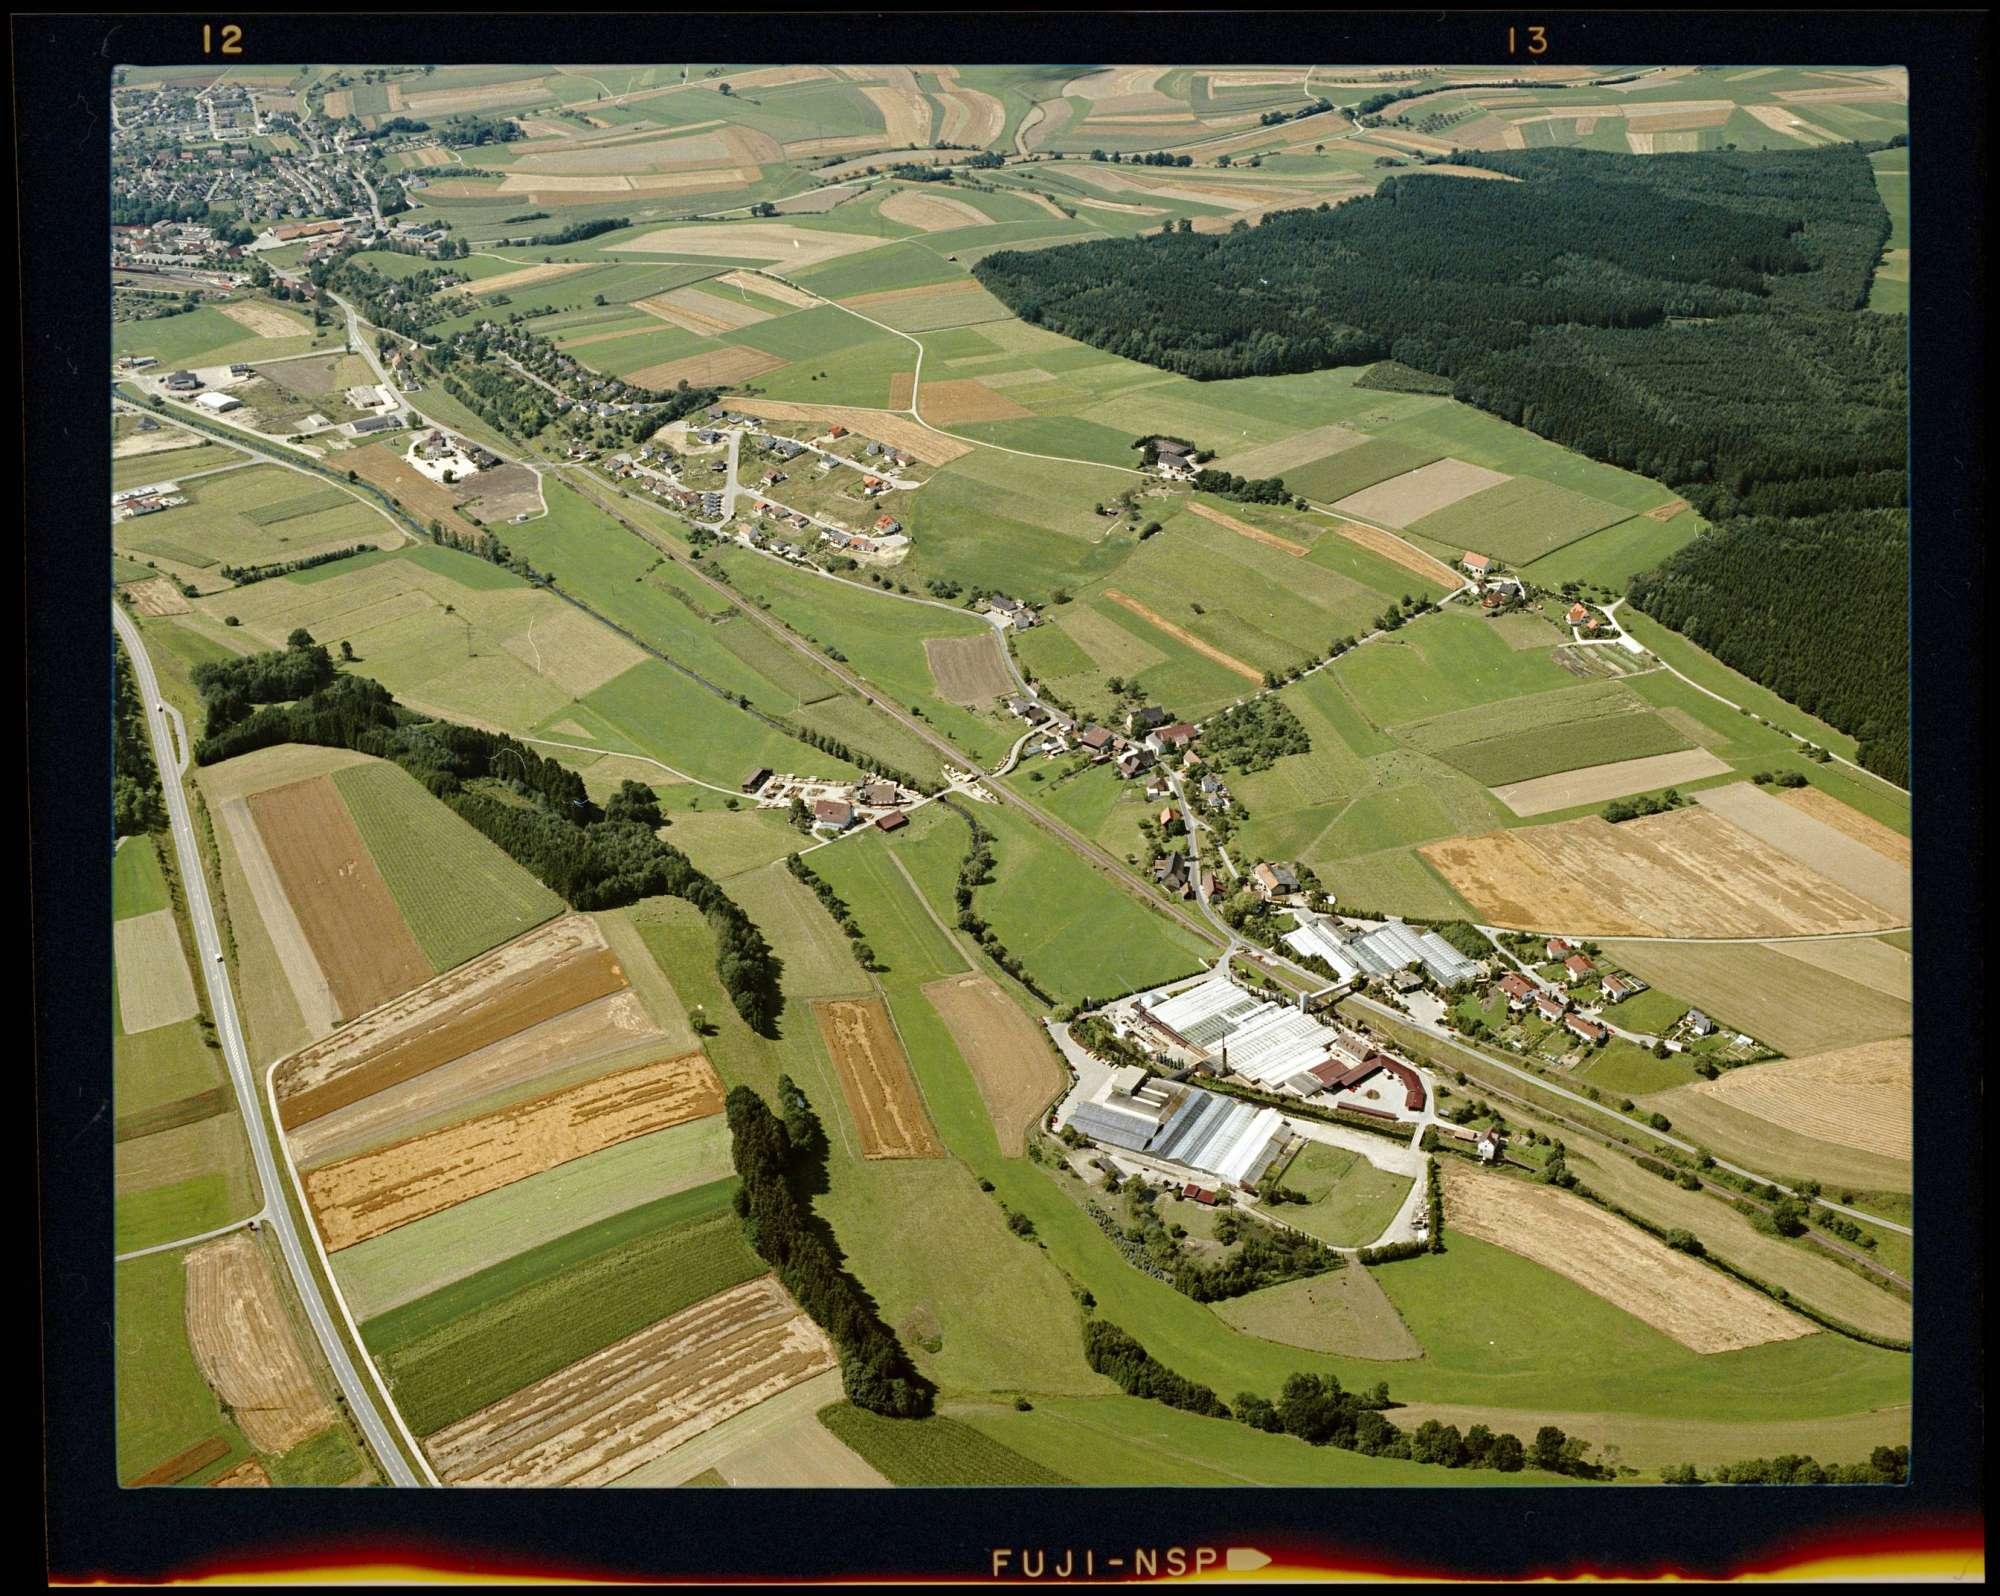 Igelswies, Luftbild, Bild 1